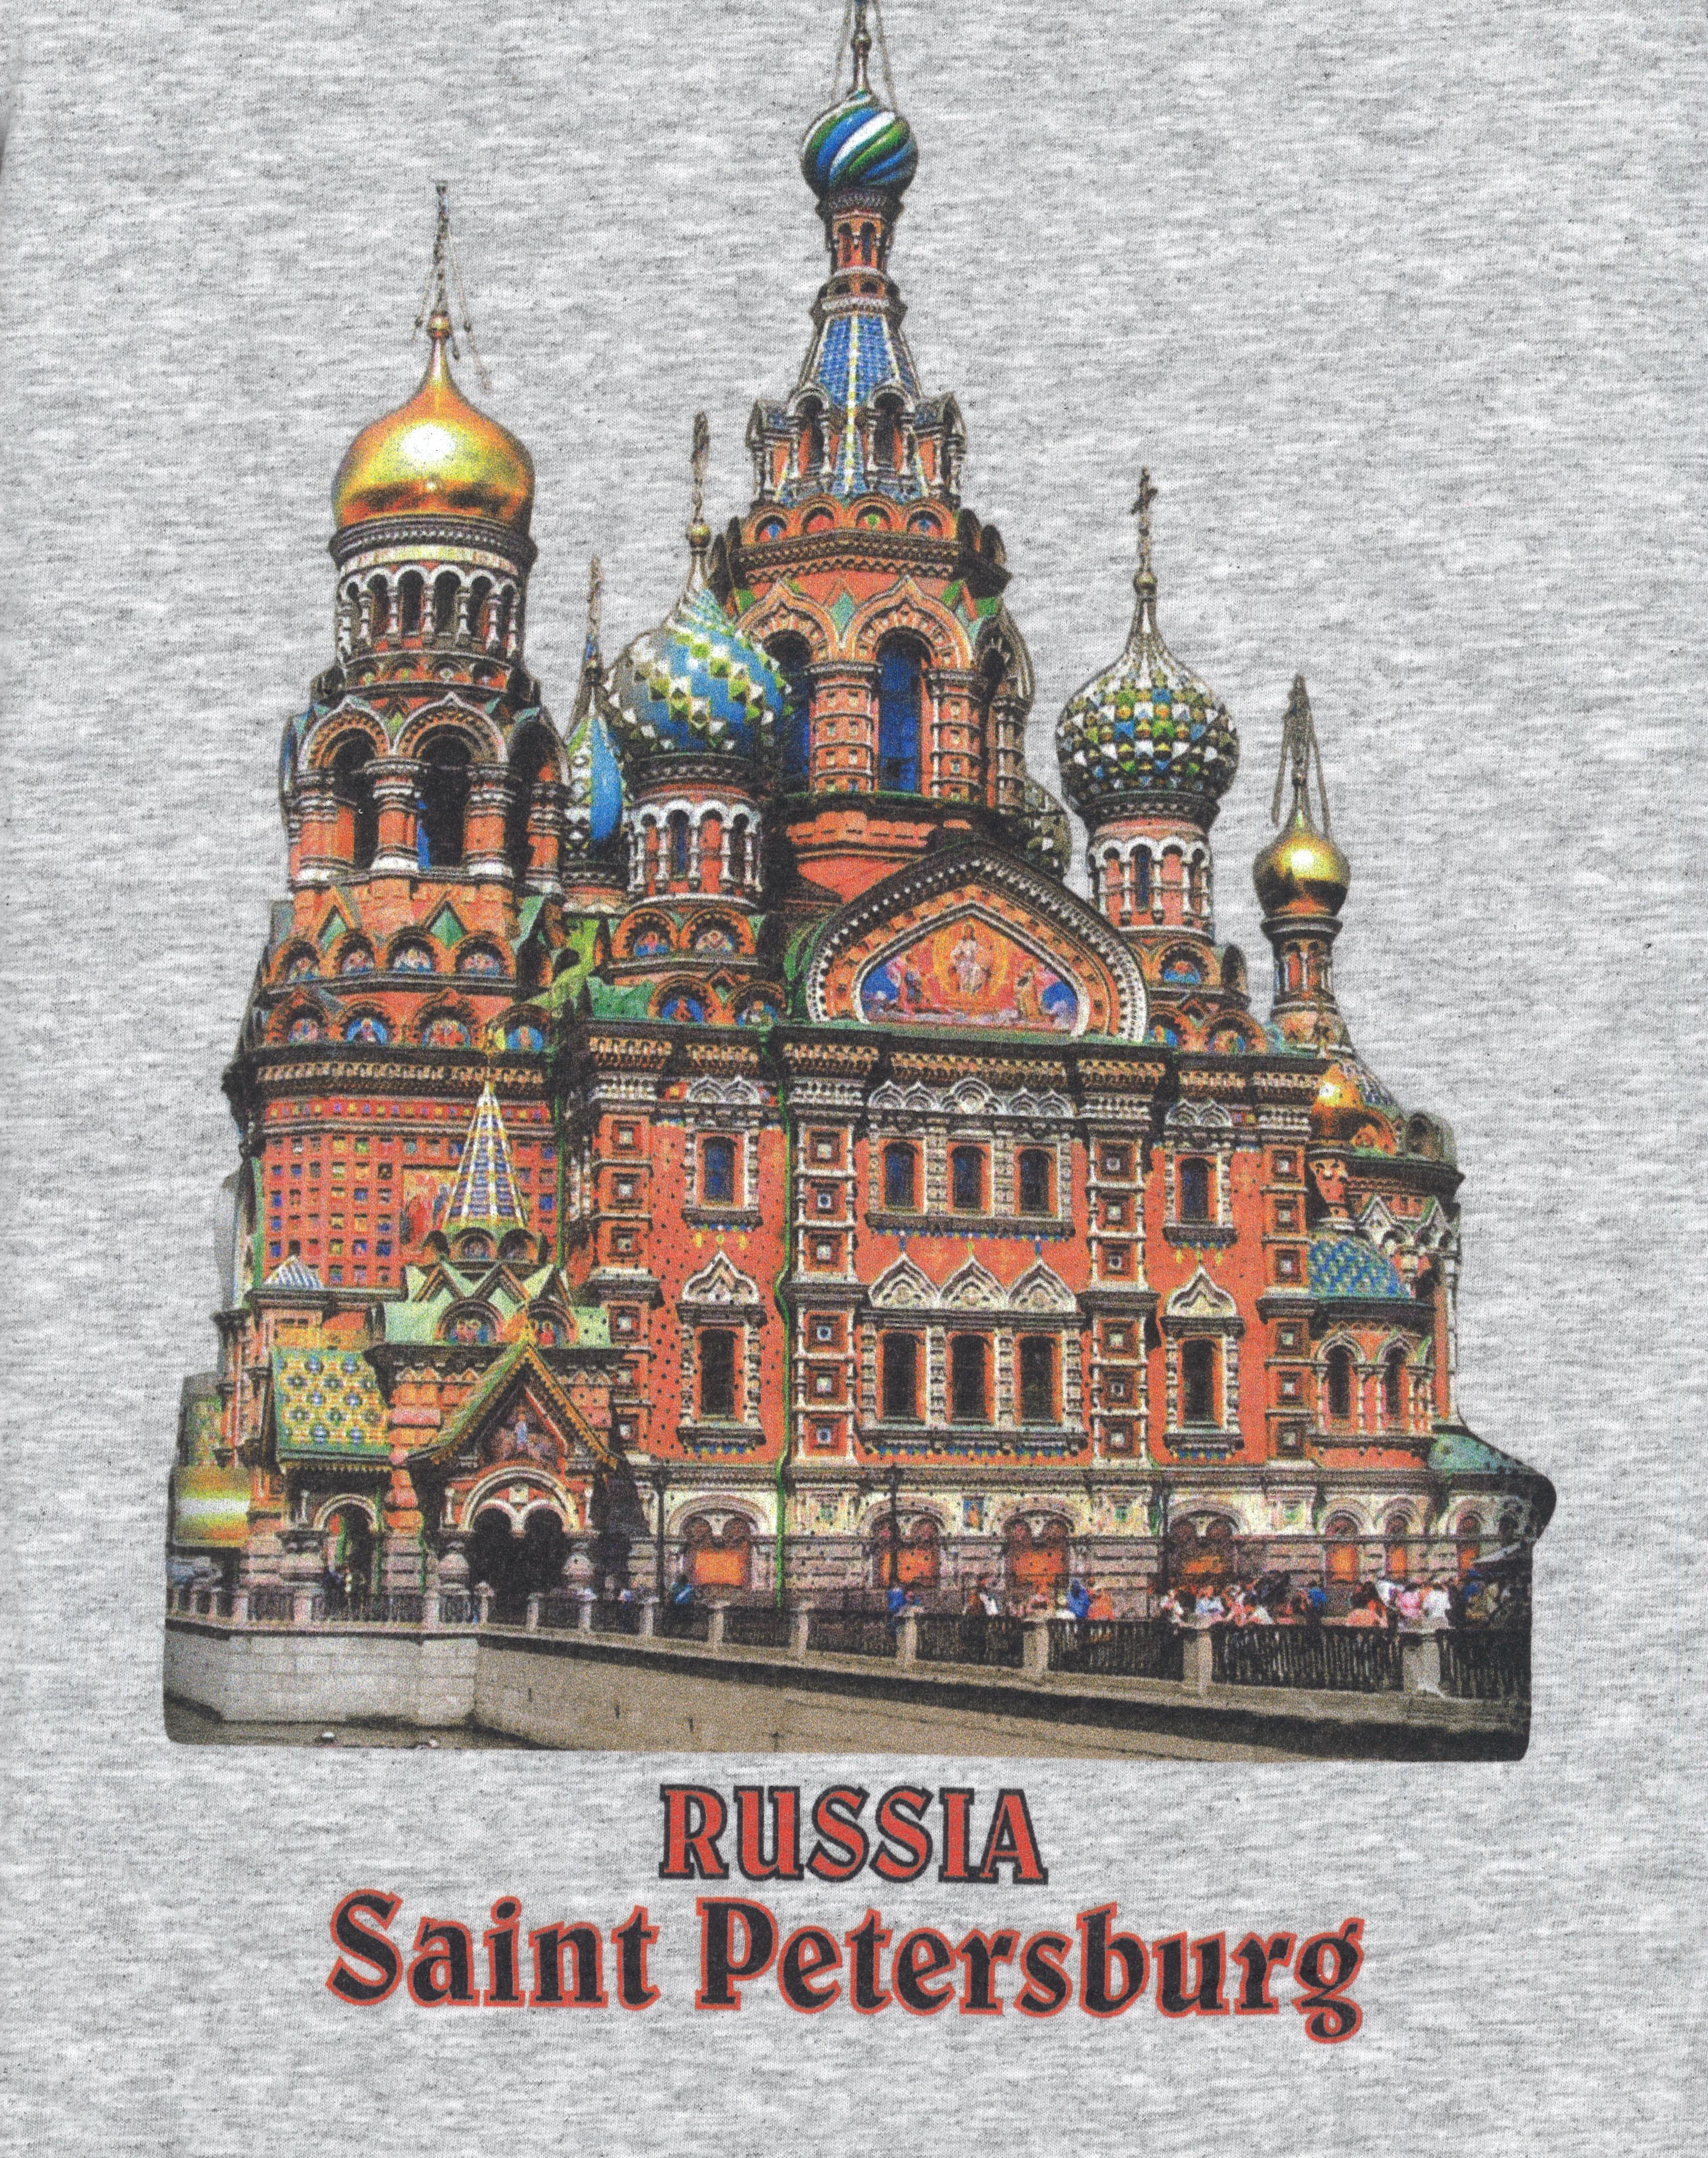 Футболка / T-shirt Россия Санкт-Петербург